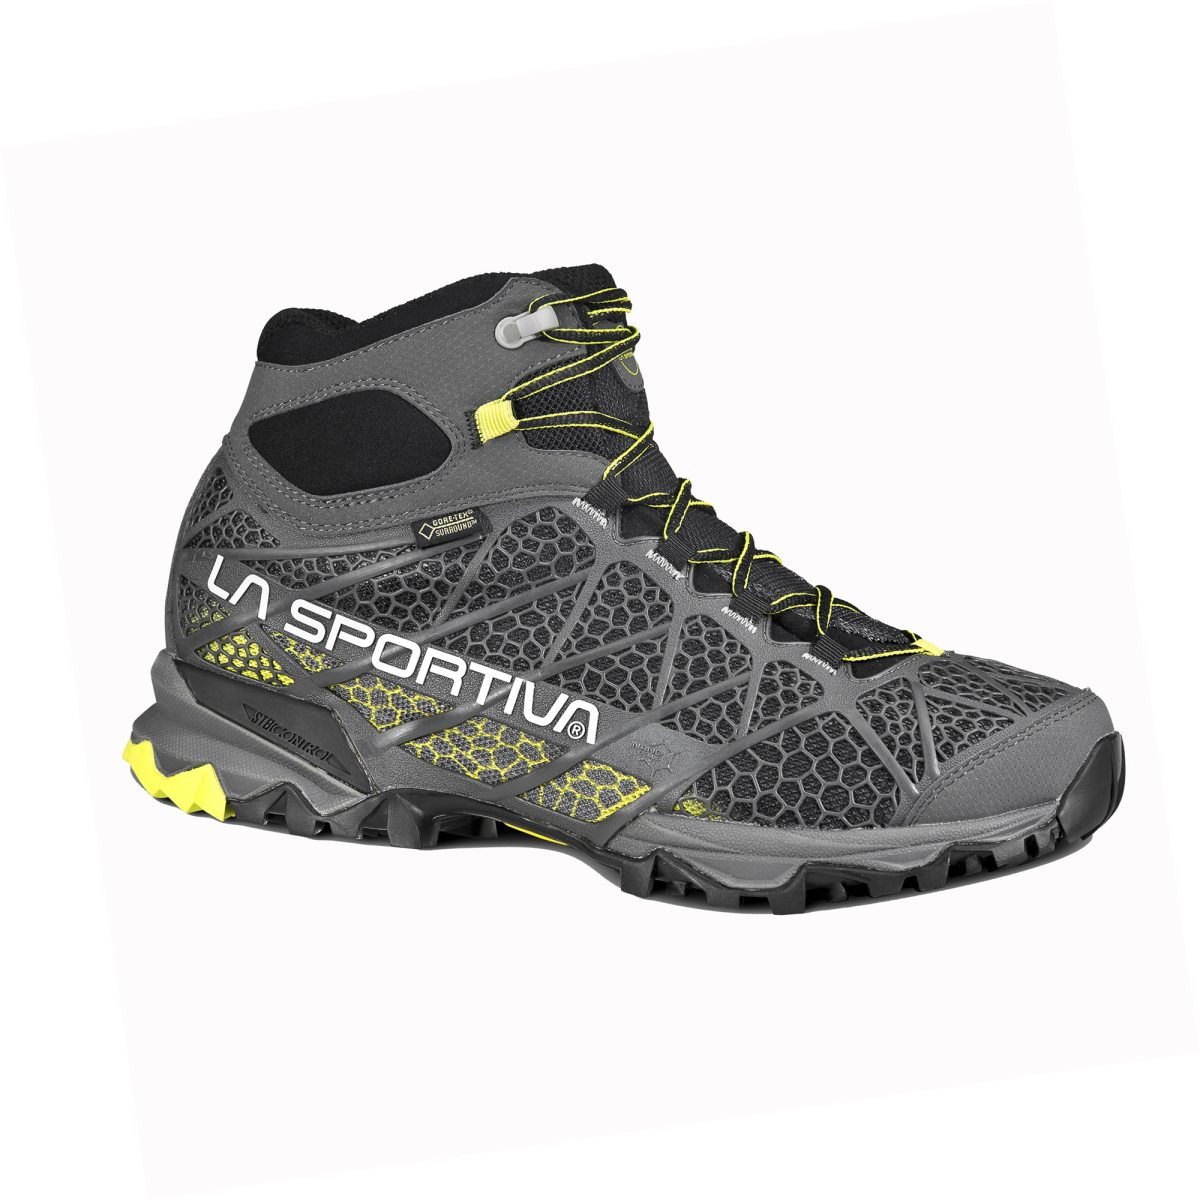 nike air max tn chaussures, plus - nb 850 b?t   CPX Paintball